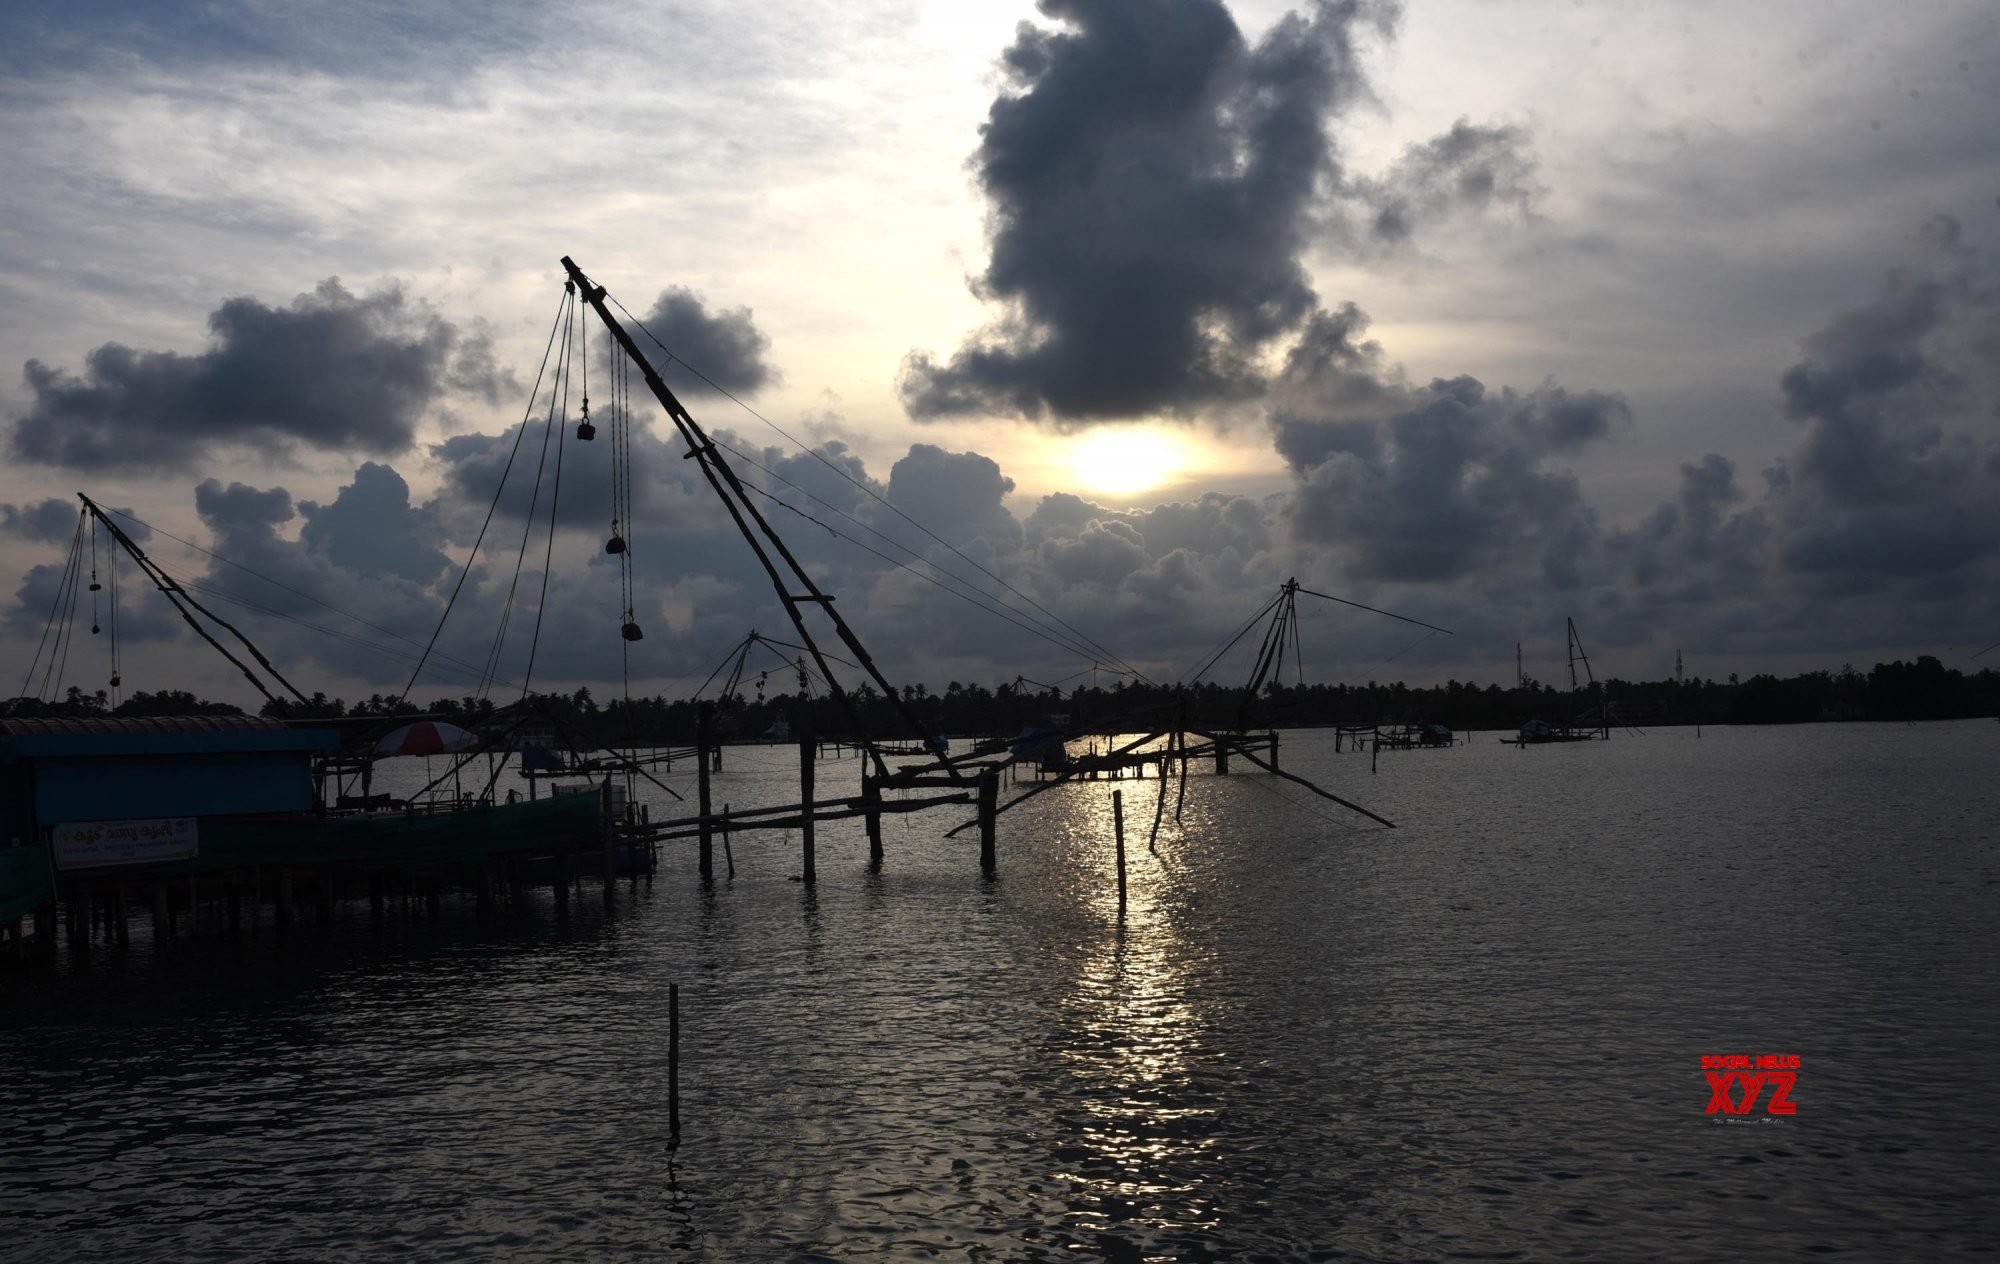 Monsoon to hit Kerala on June 6: IMD